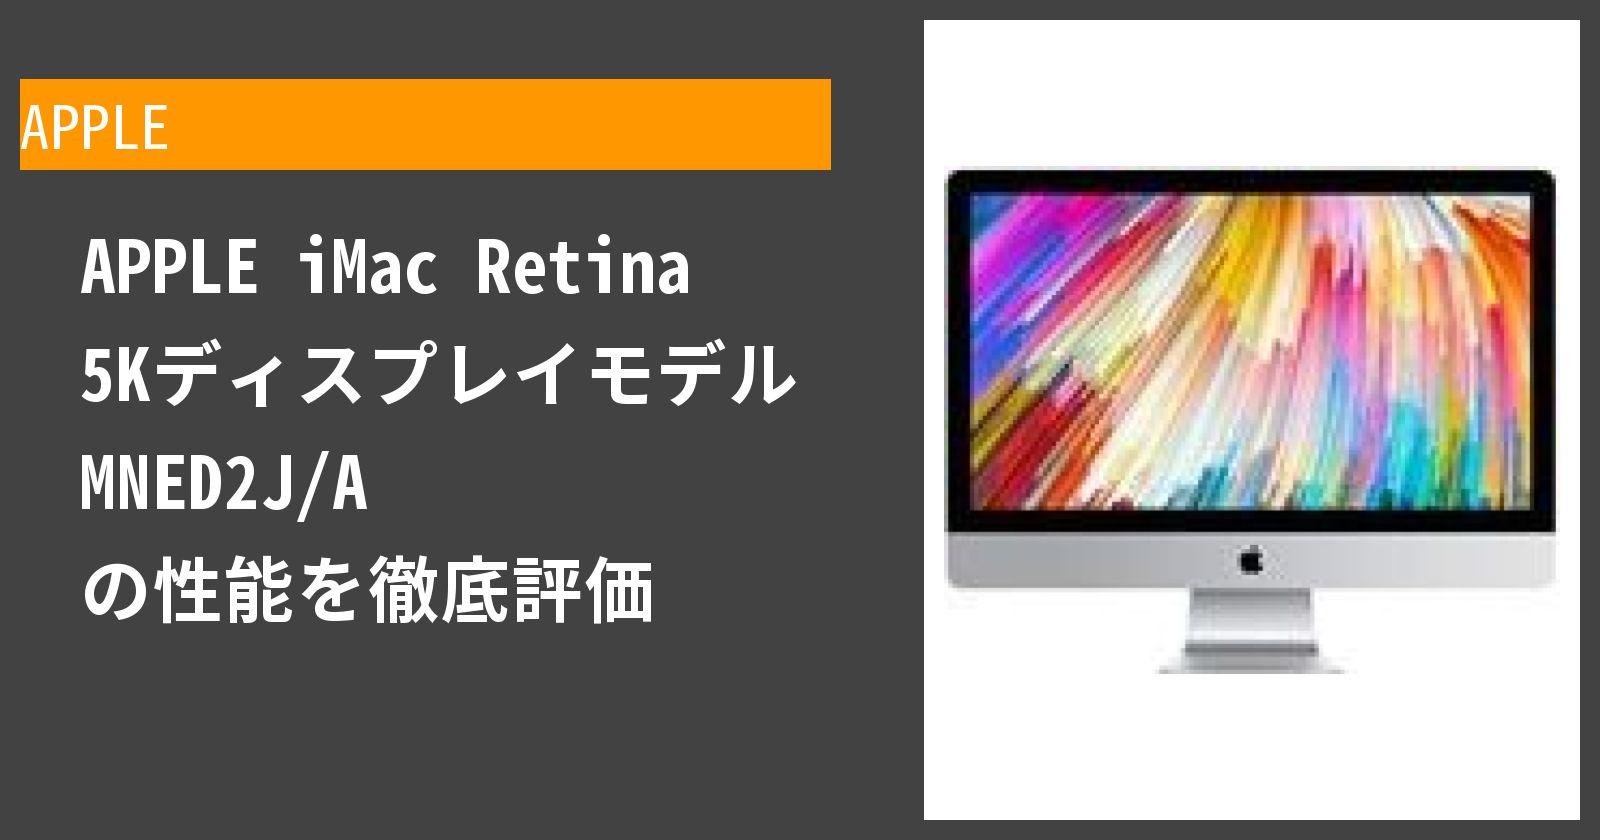 iMac Retina 5K(MNED2J/A) の性能を徹底評価